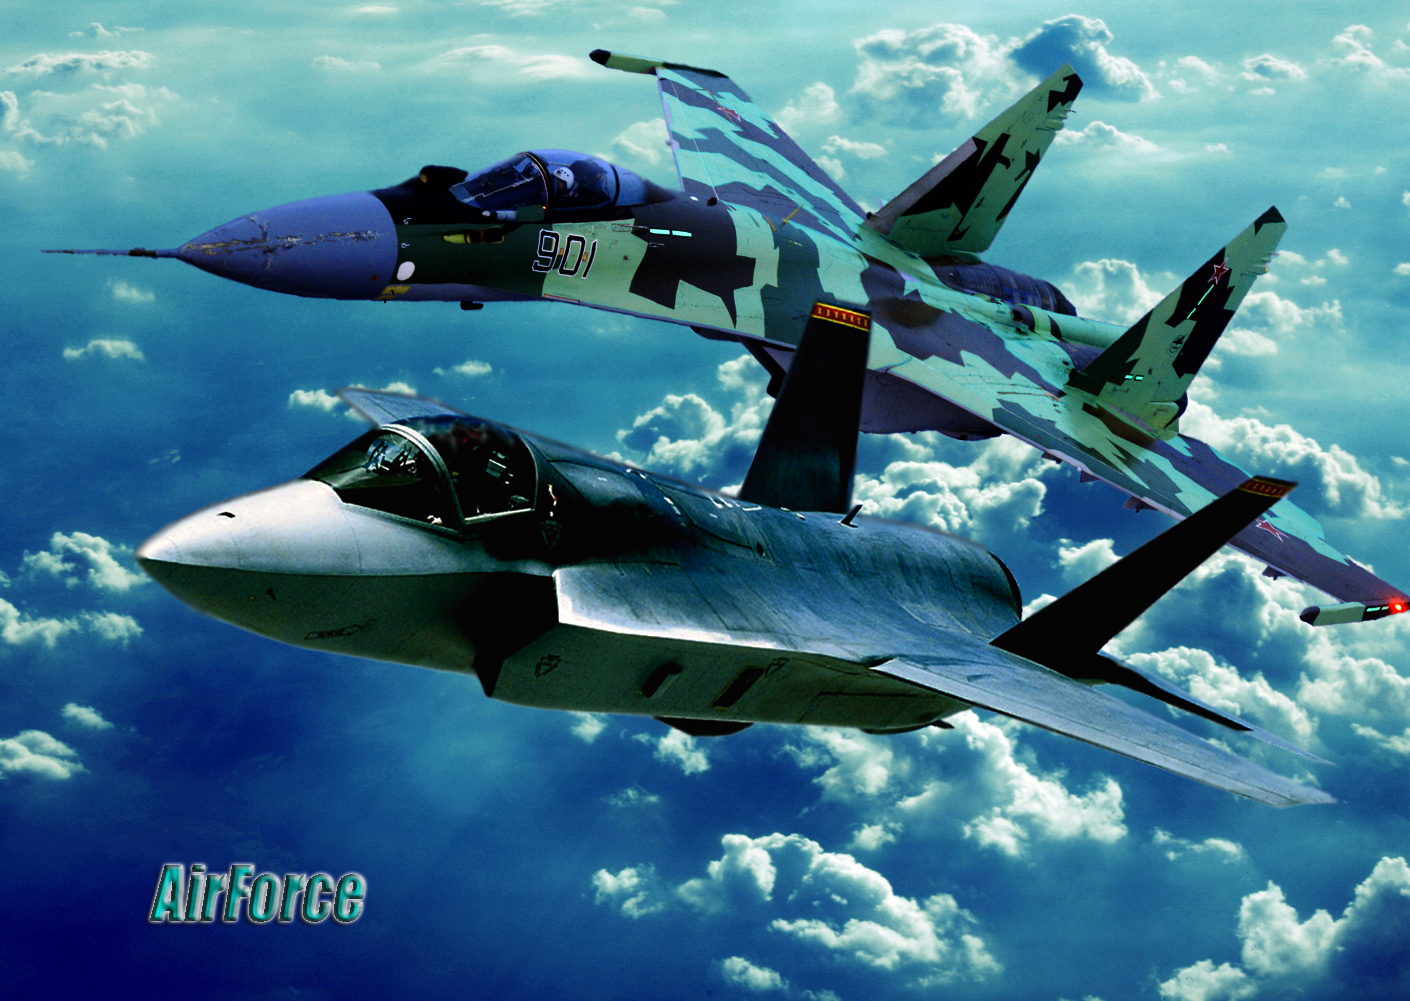 Su 35 (航空機)の画像 p1_32